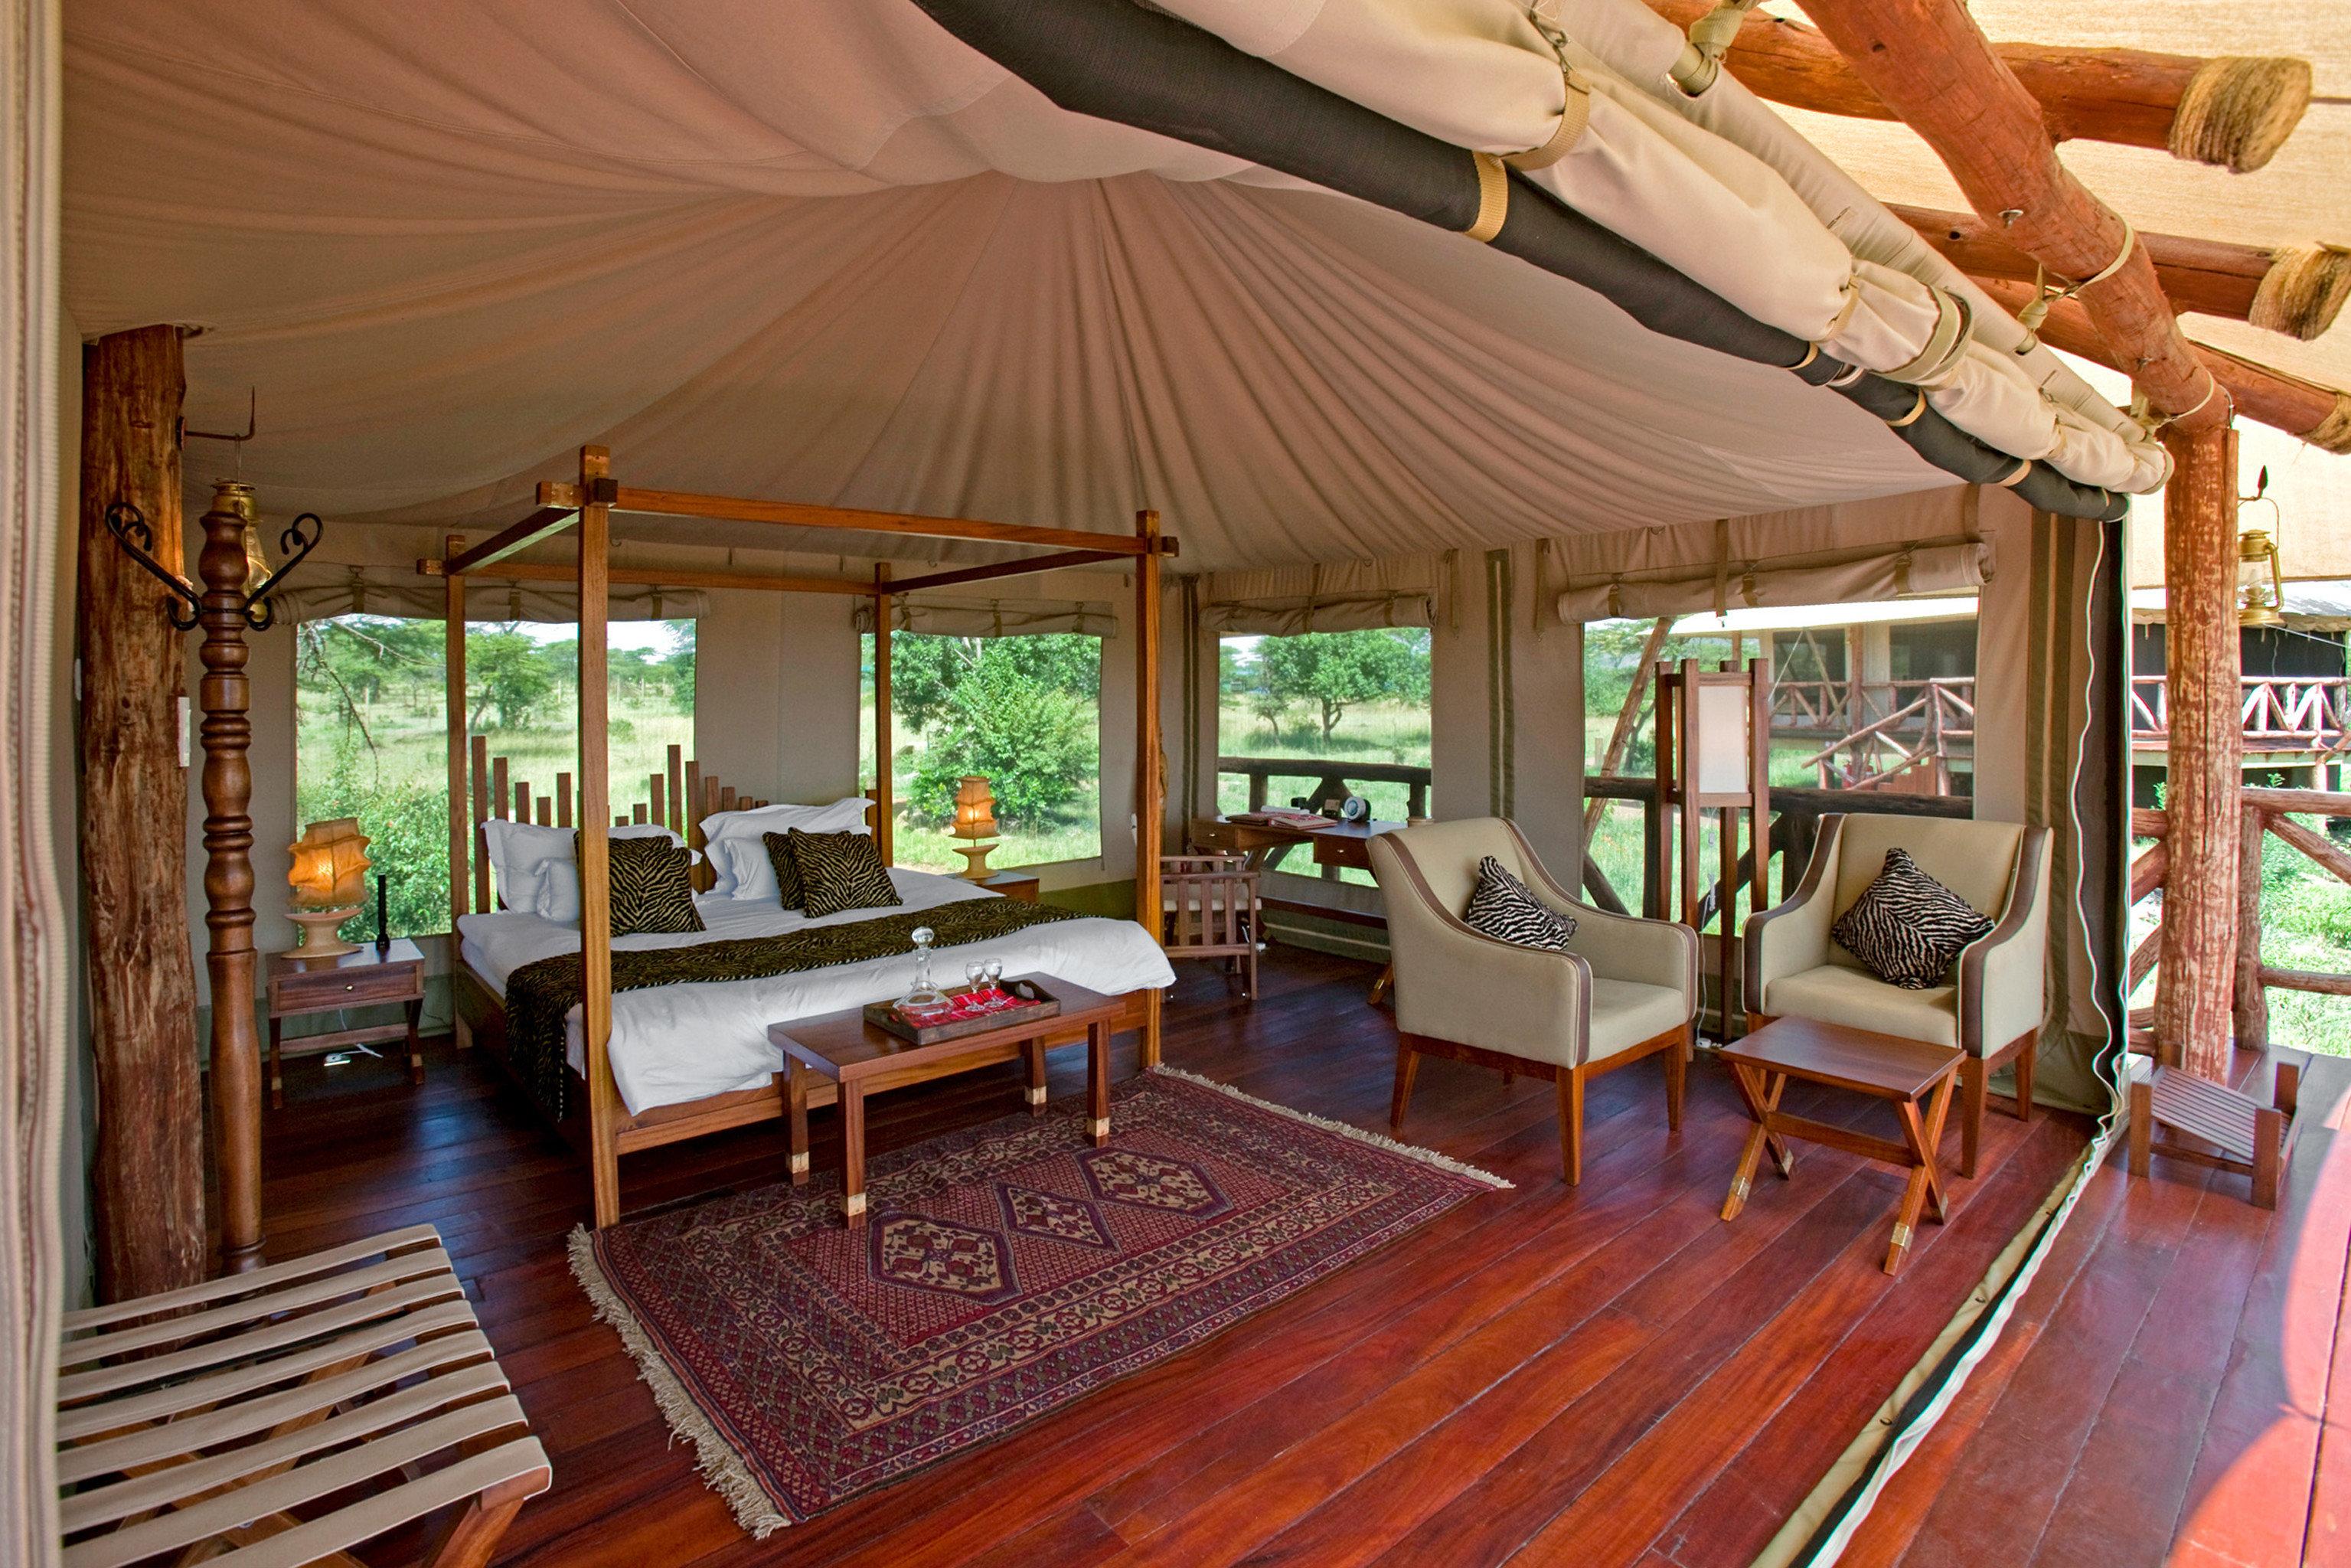 Bedroom Lounge Luxury Modern Suite property Resort Villa cottage home outdoor structure